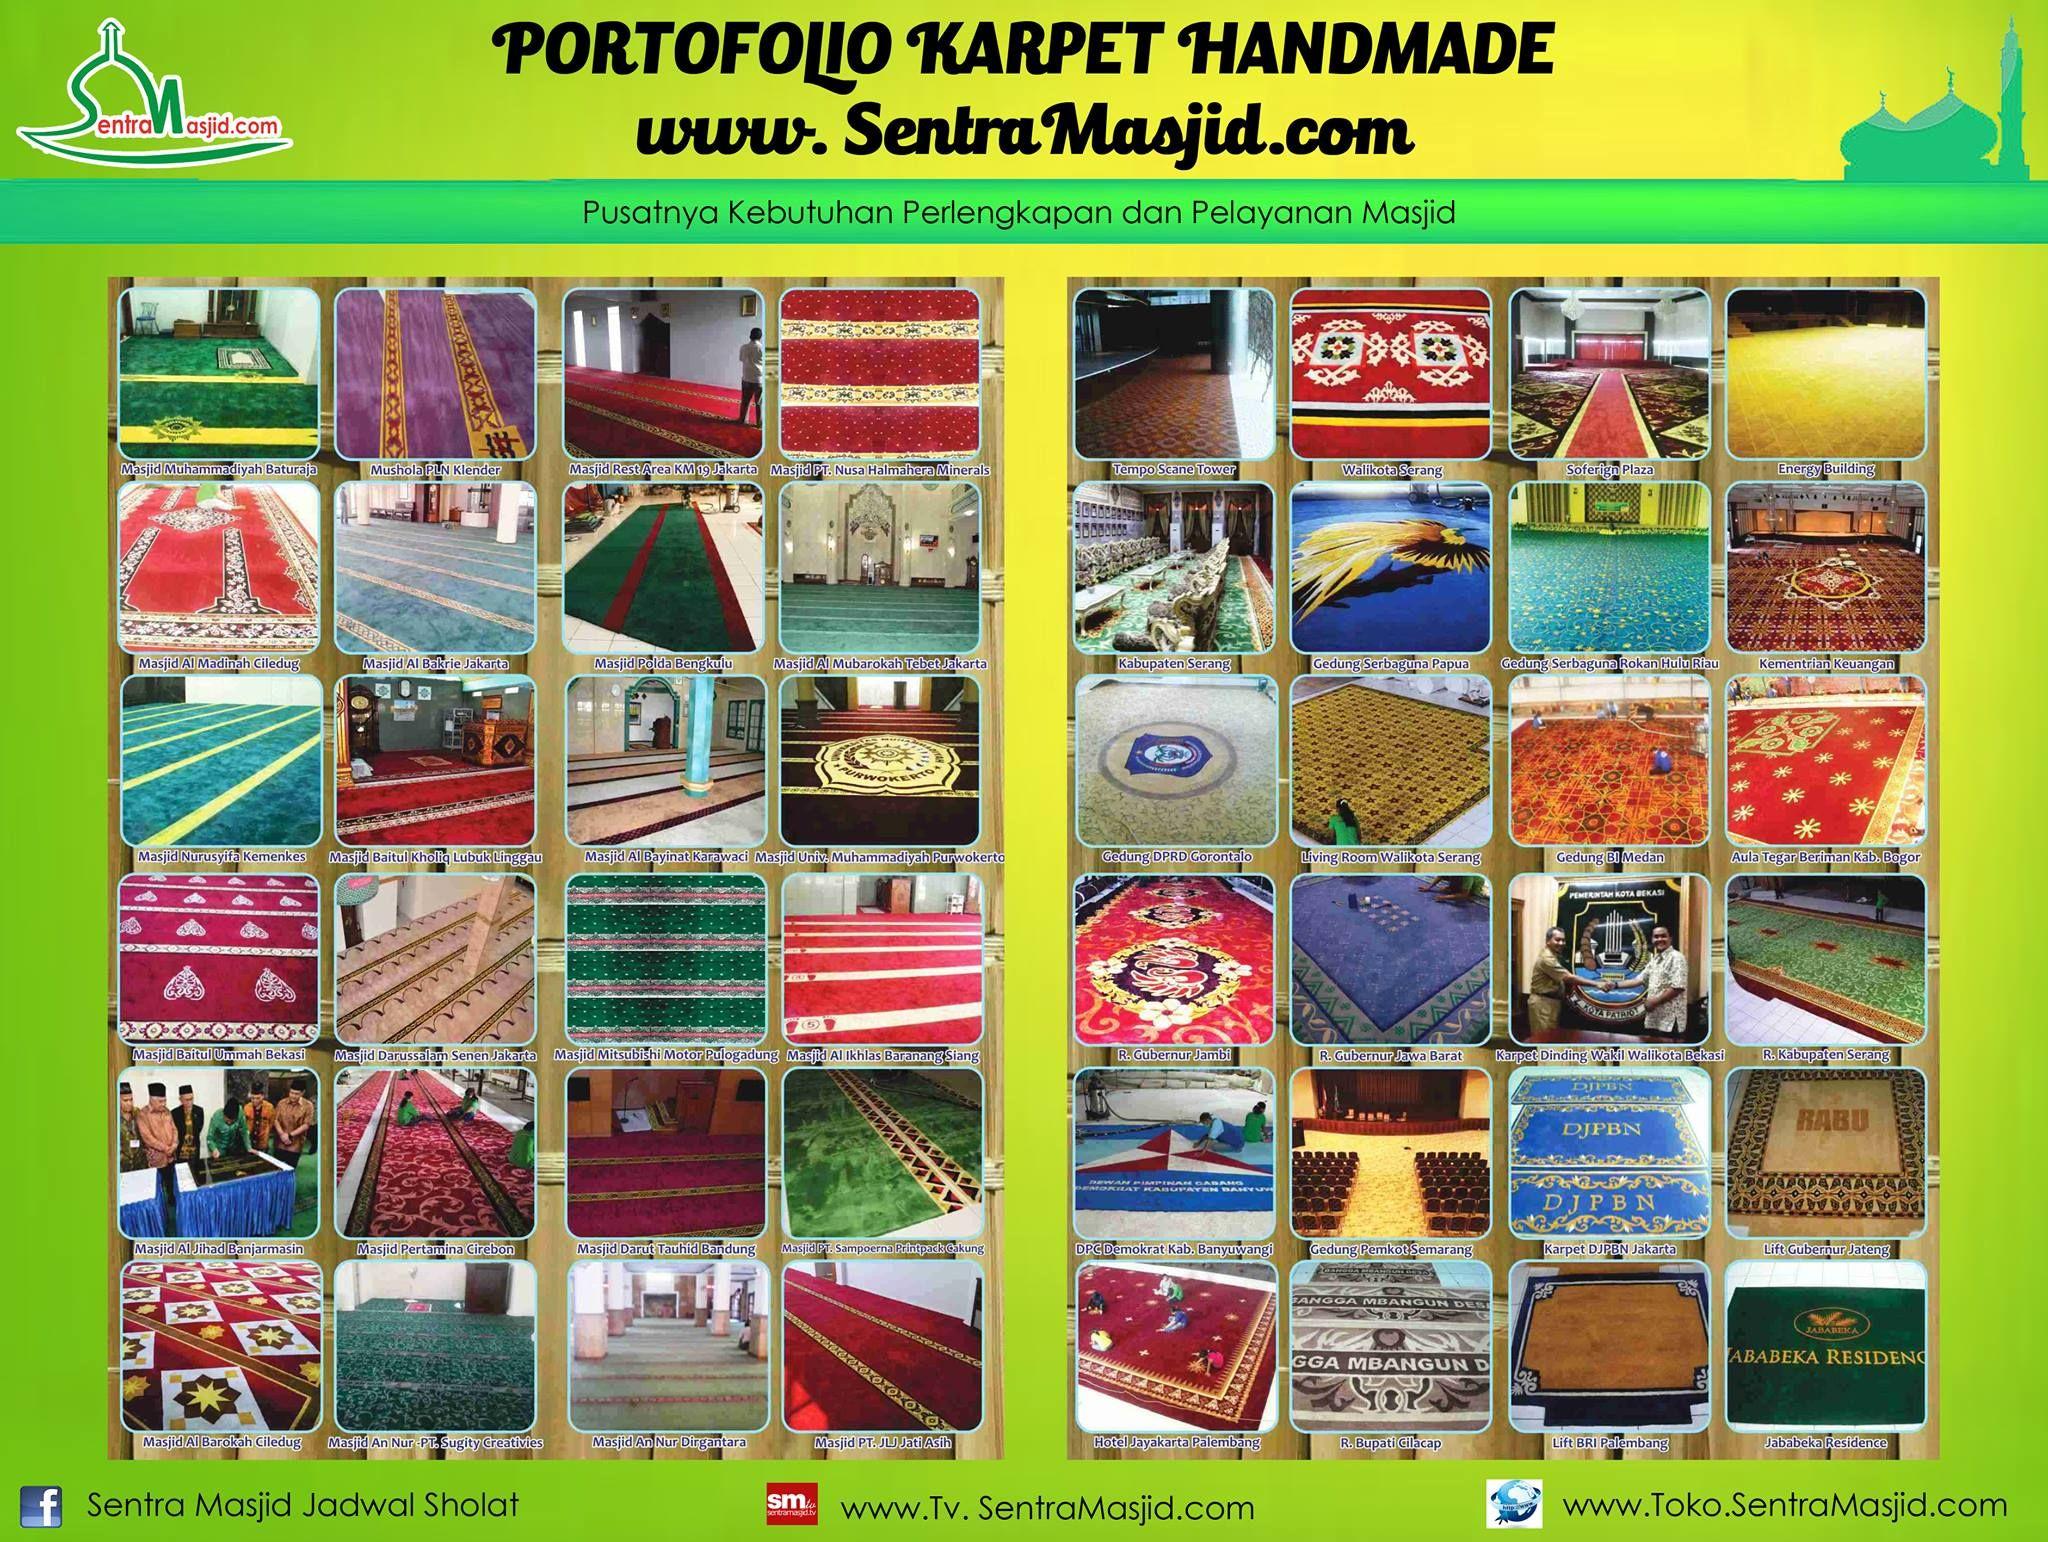 Sentra Masjid menghadirkan beraneka jenis karpet yang